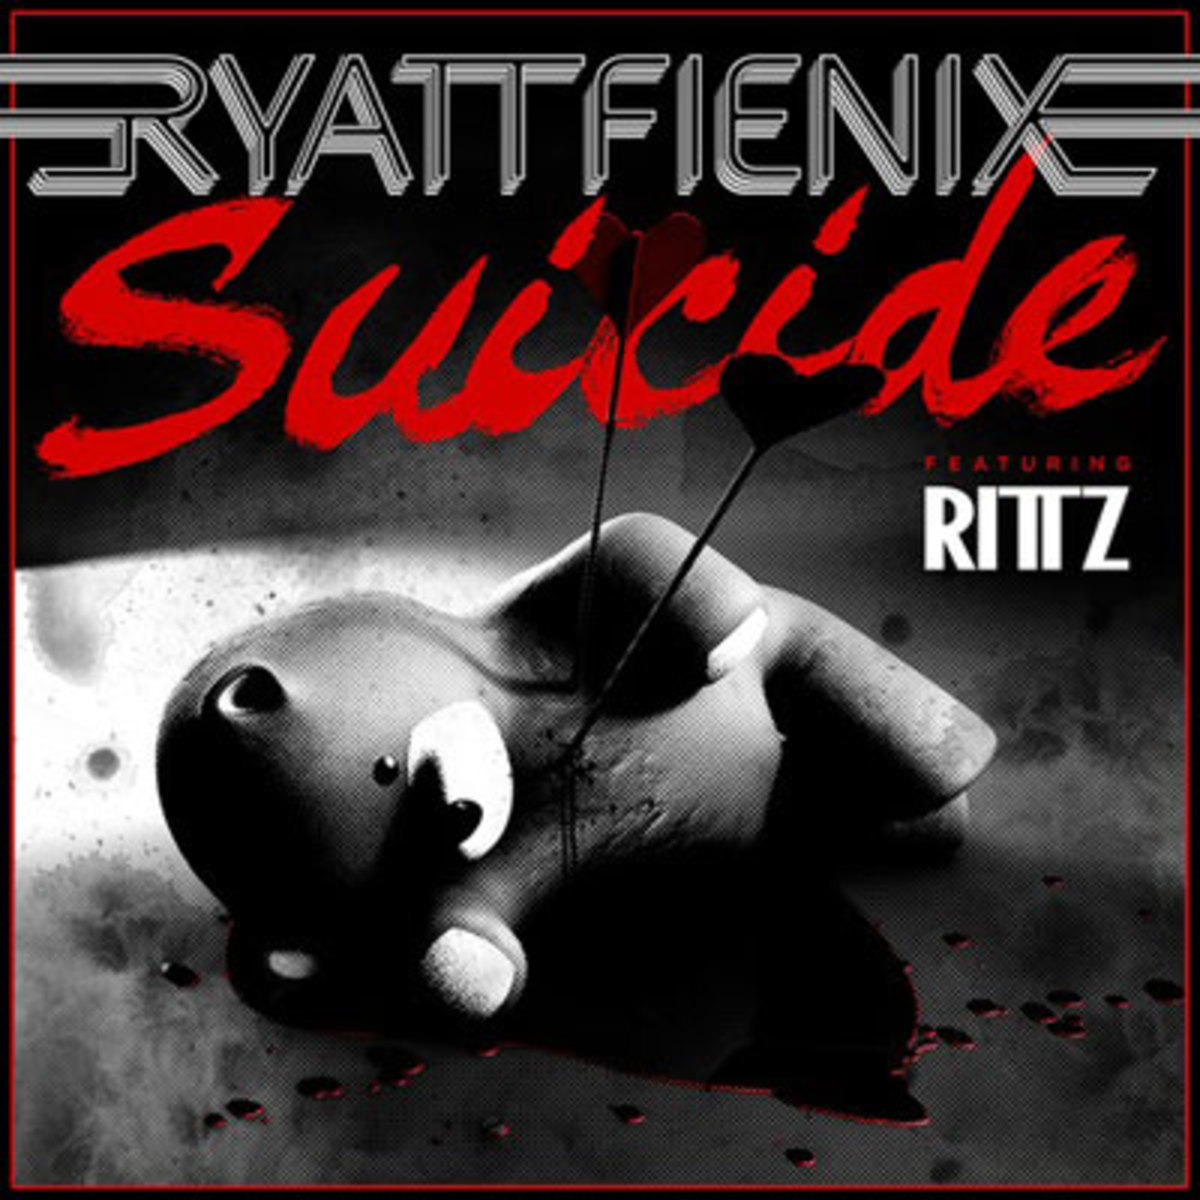 ryattfeinix-suicide.jpg